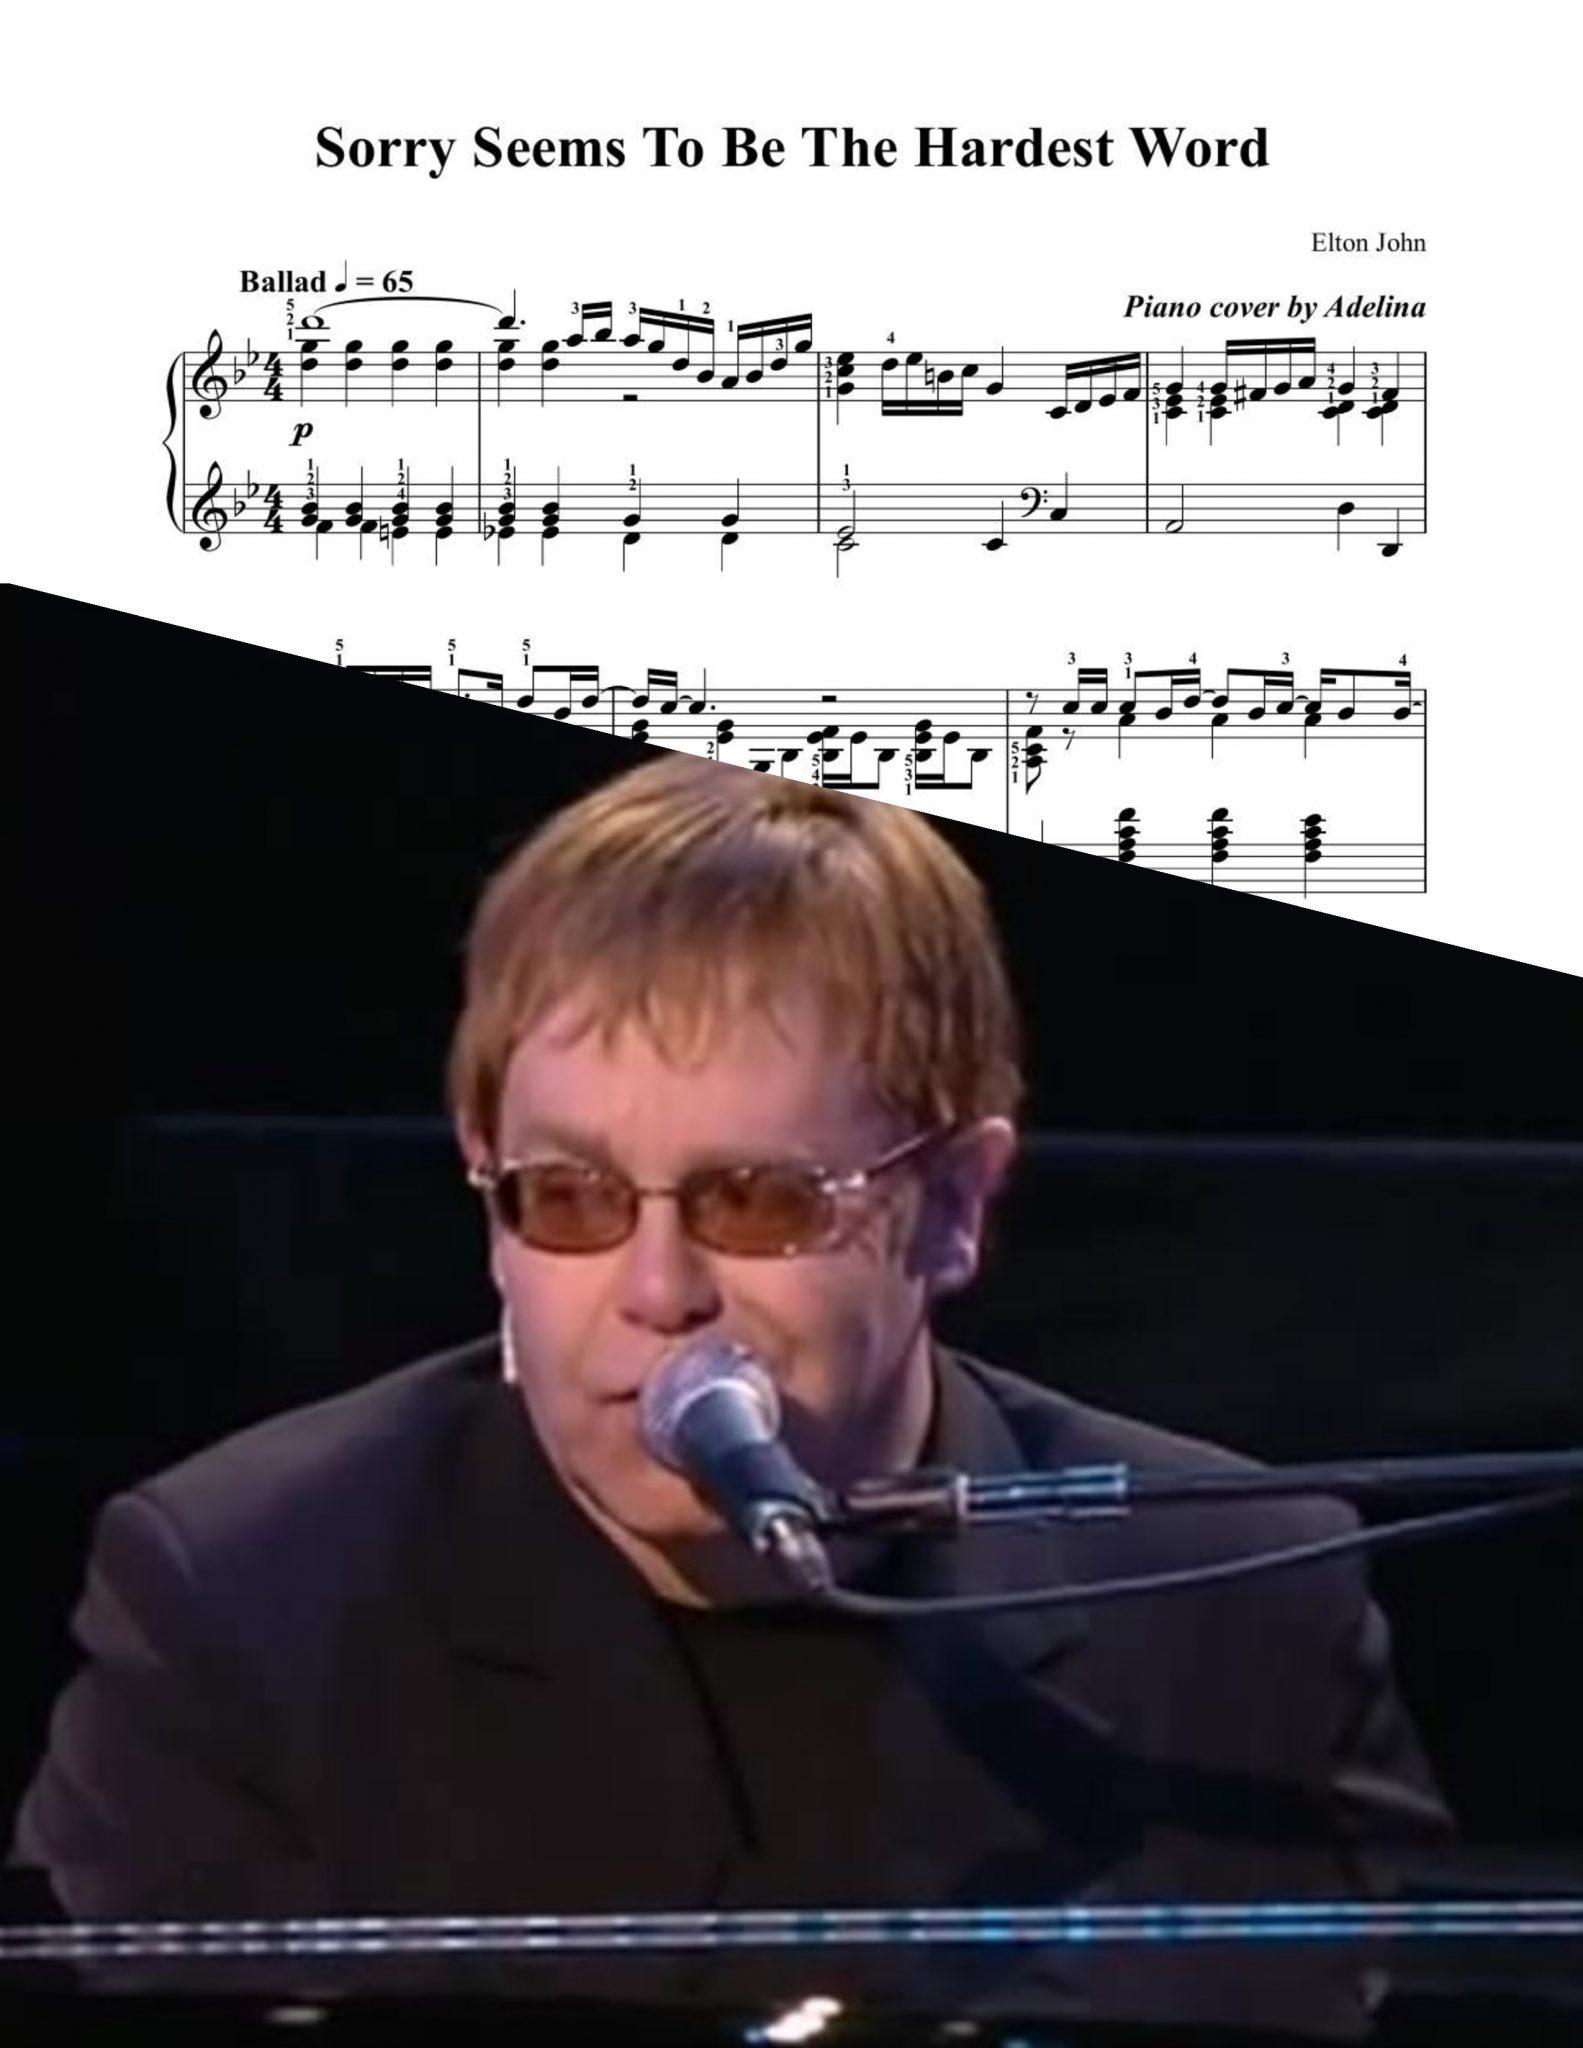 Elton john sorry seems to be the hardest word lyrics